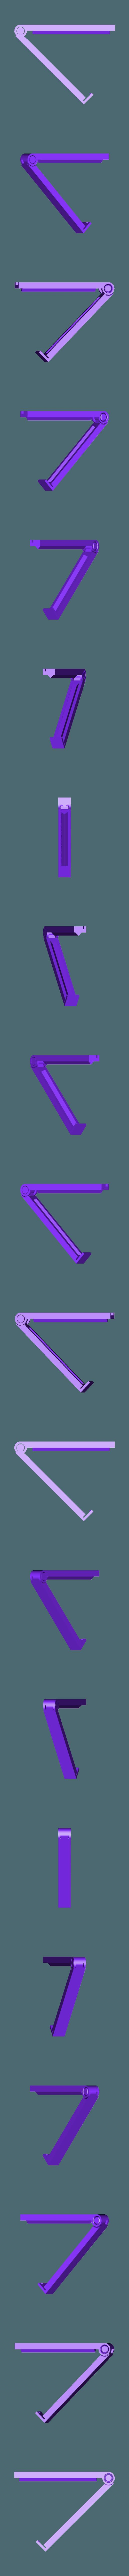 Tueten-Klemme_70mm.stl Download free SCAD file Customizable Bag Clip • 3D printable design, dede67